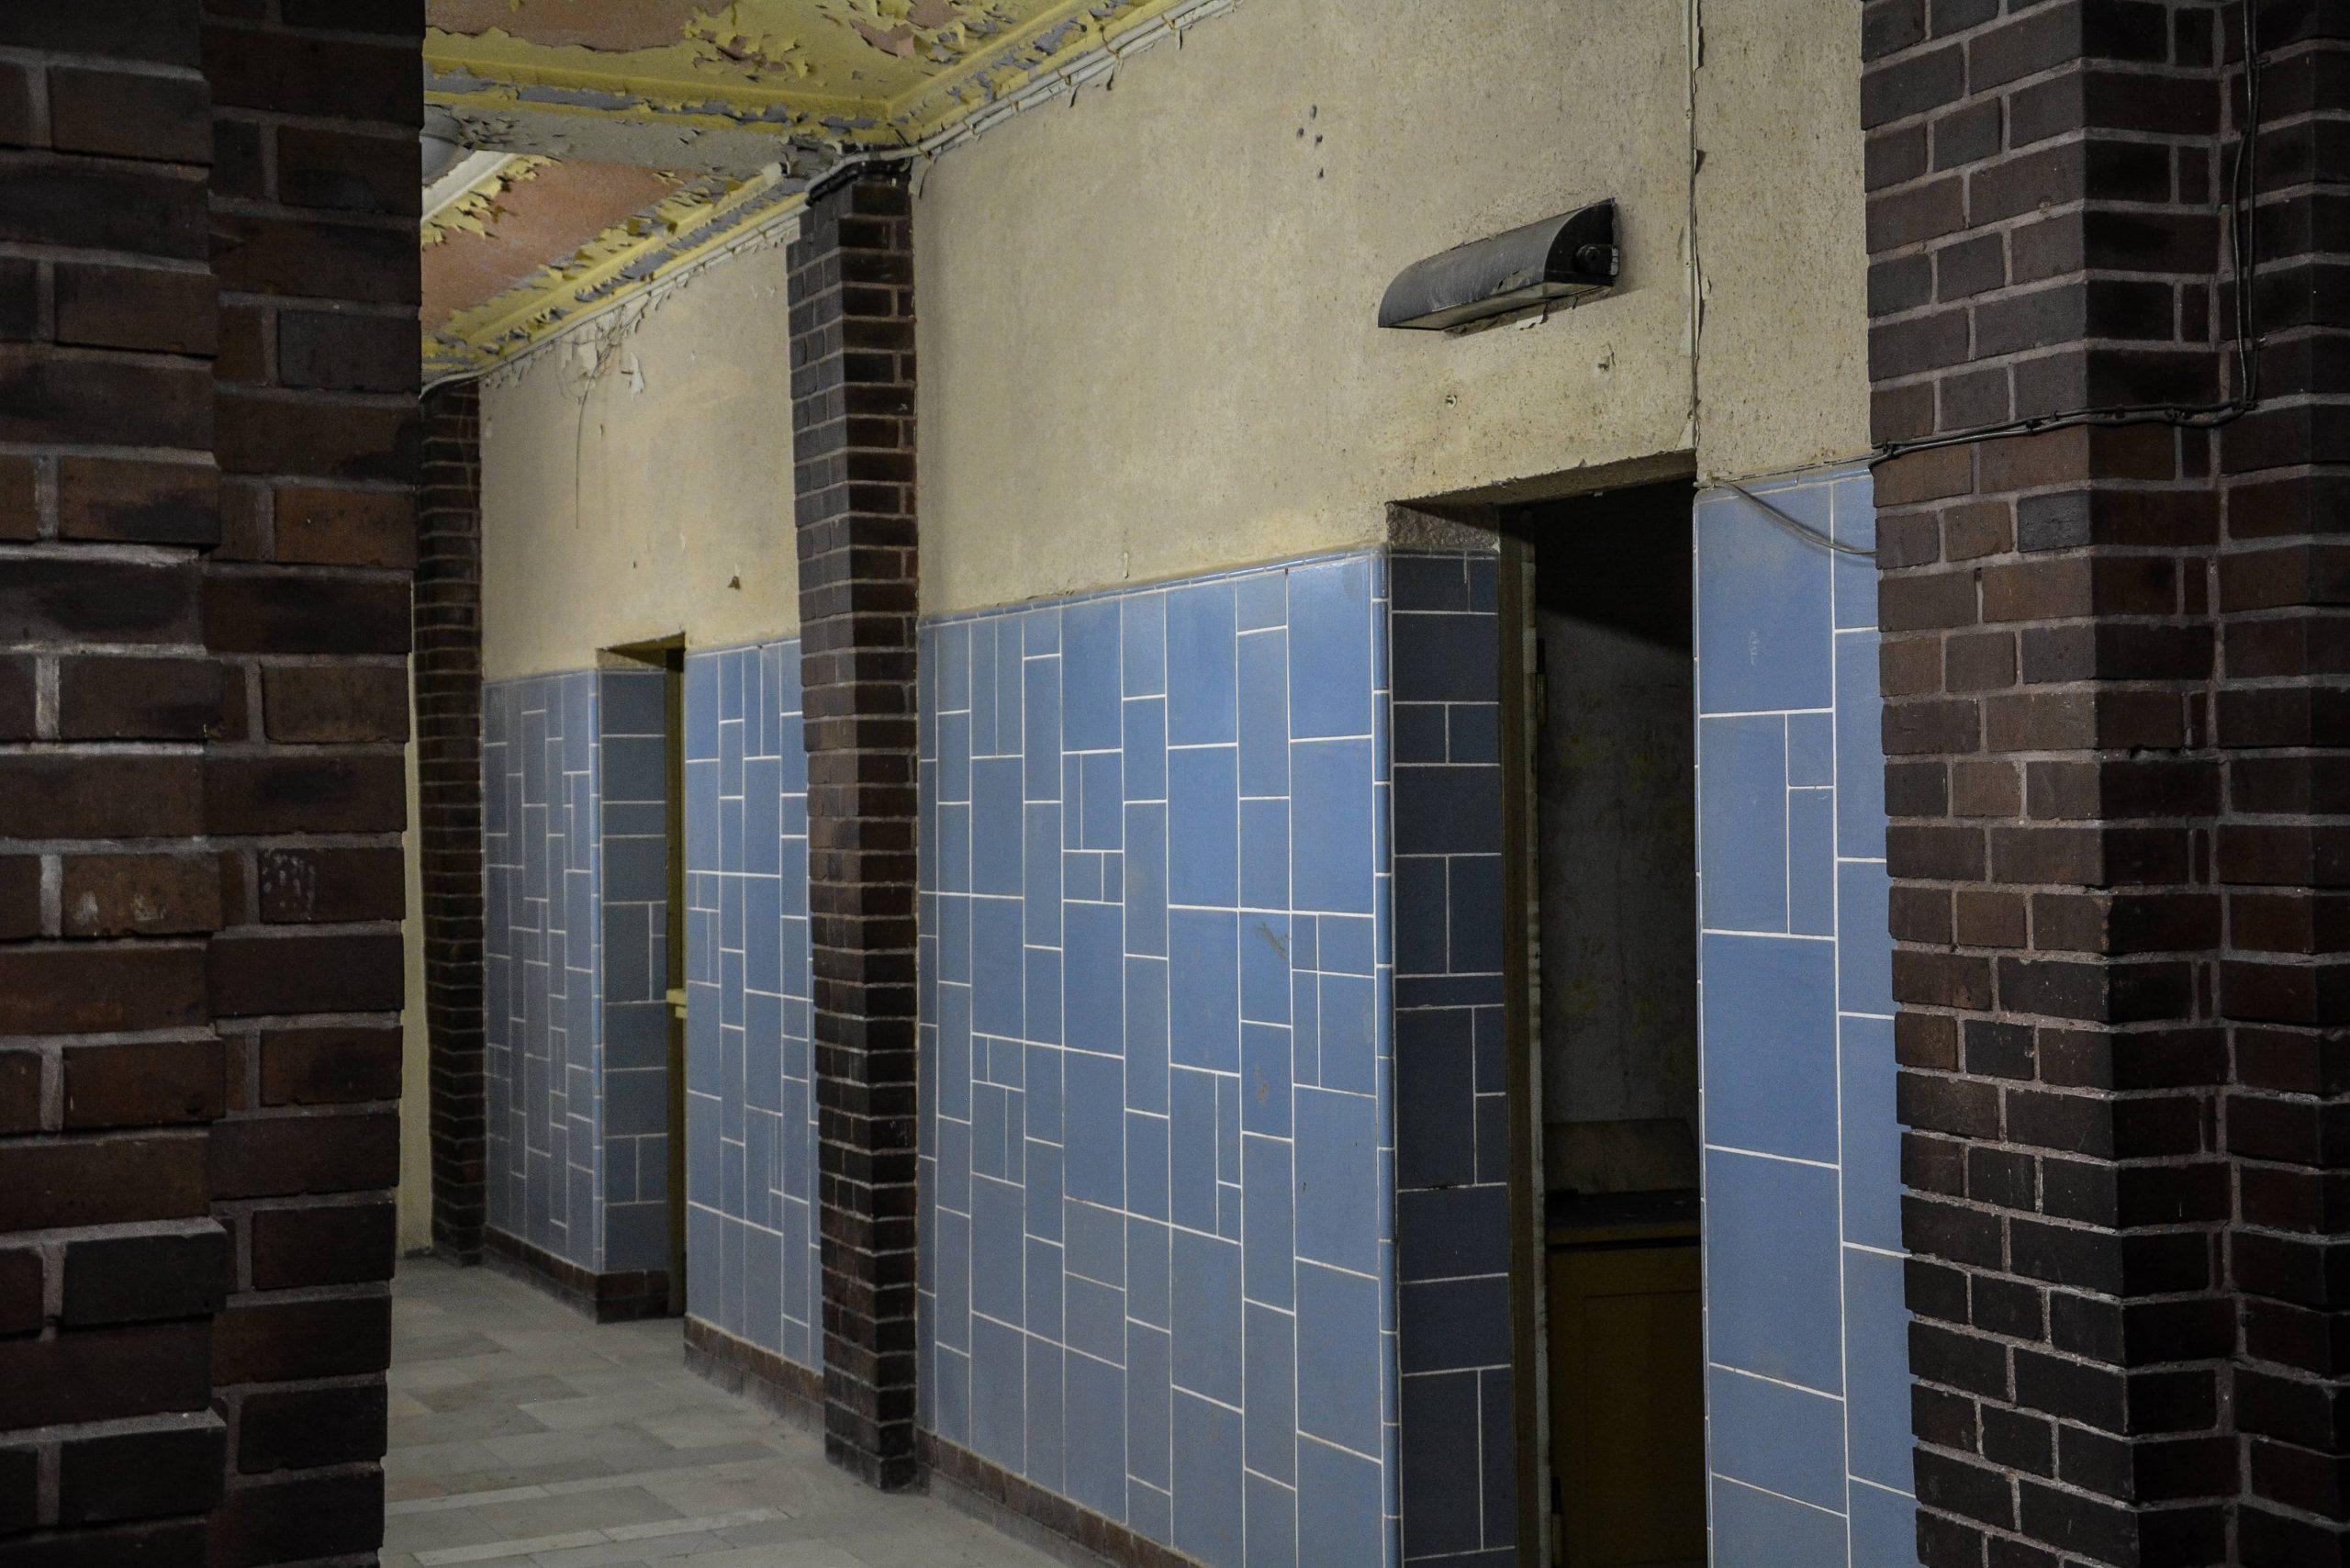 blue tiles stadtbad lichtenberg hubertusbad berlin abandoned pool urbex lost places